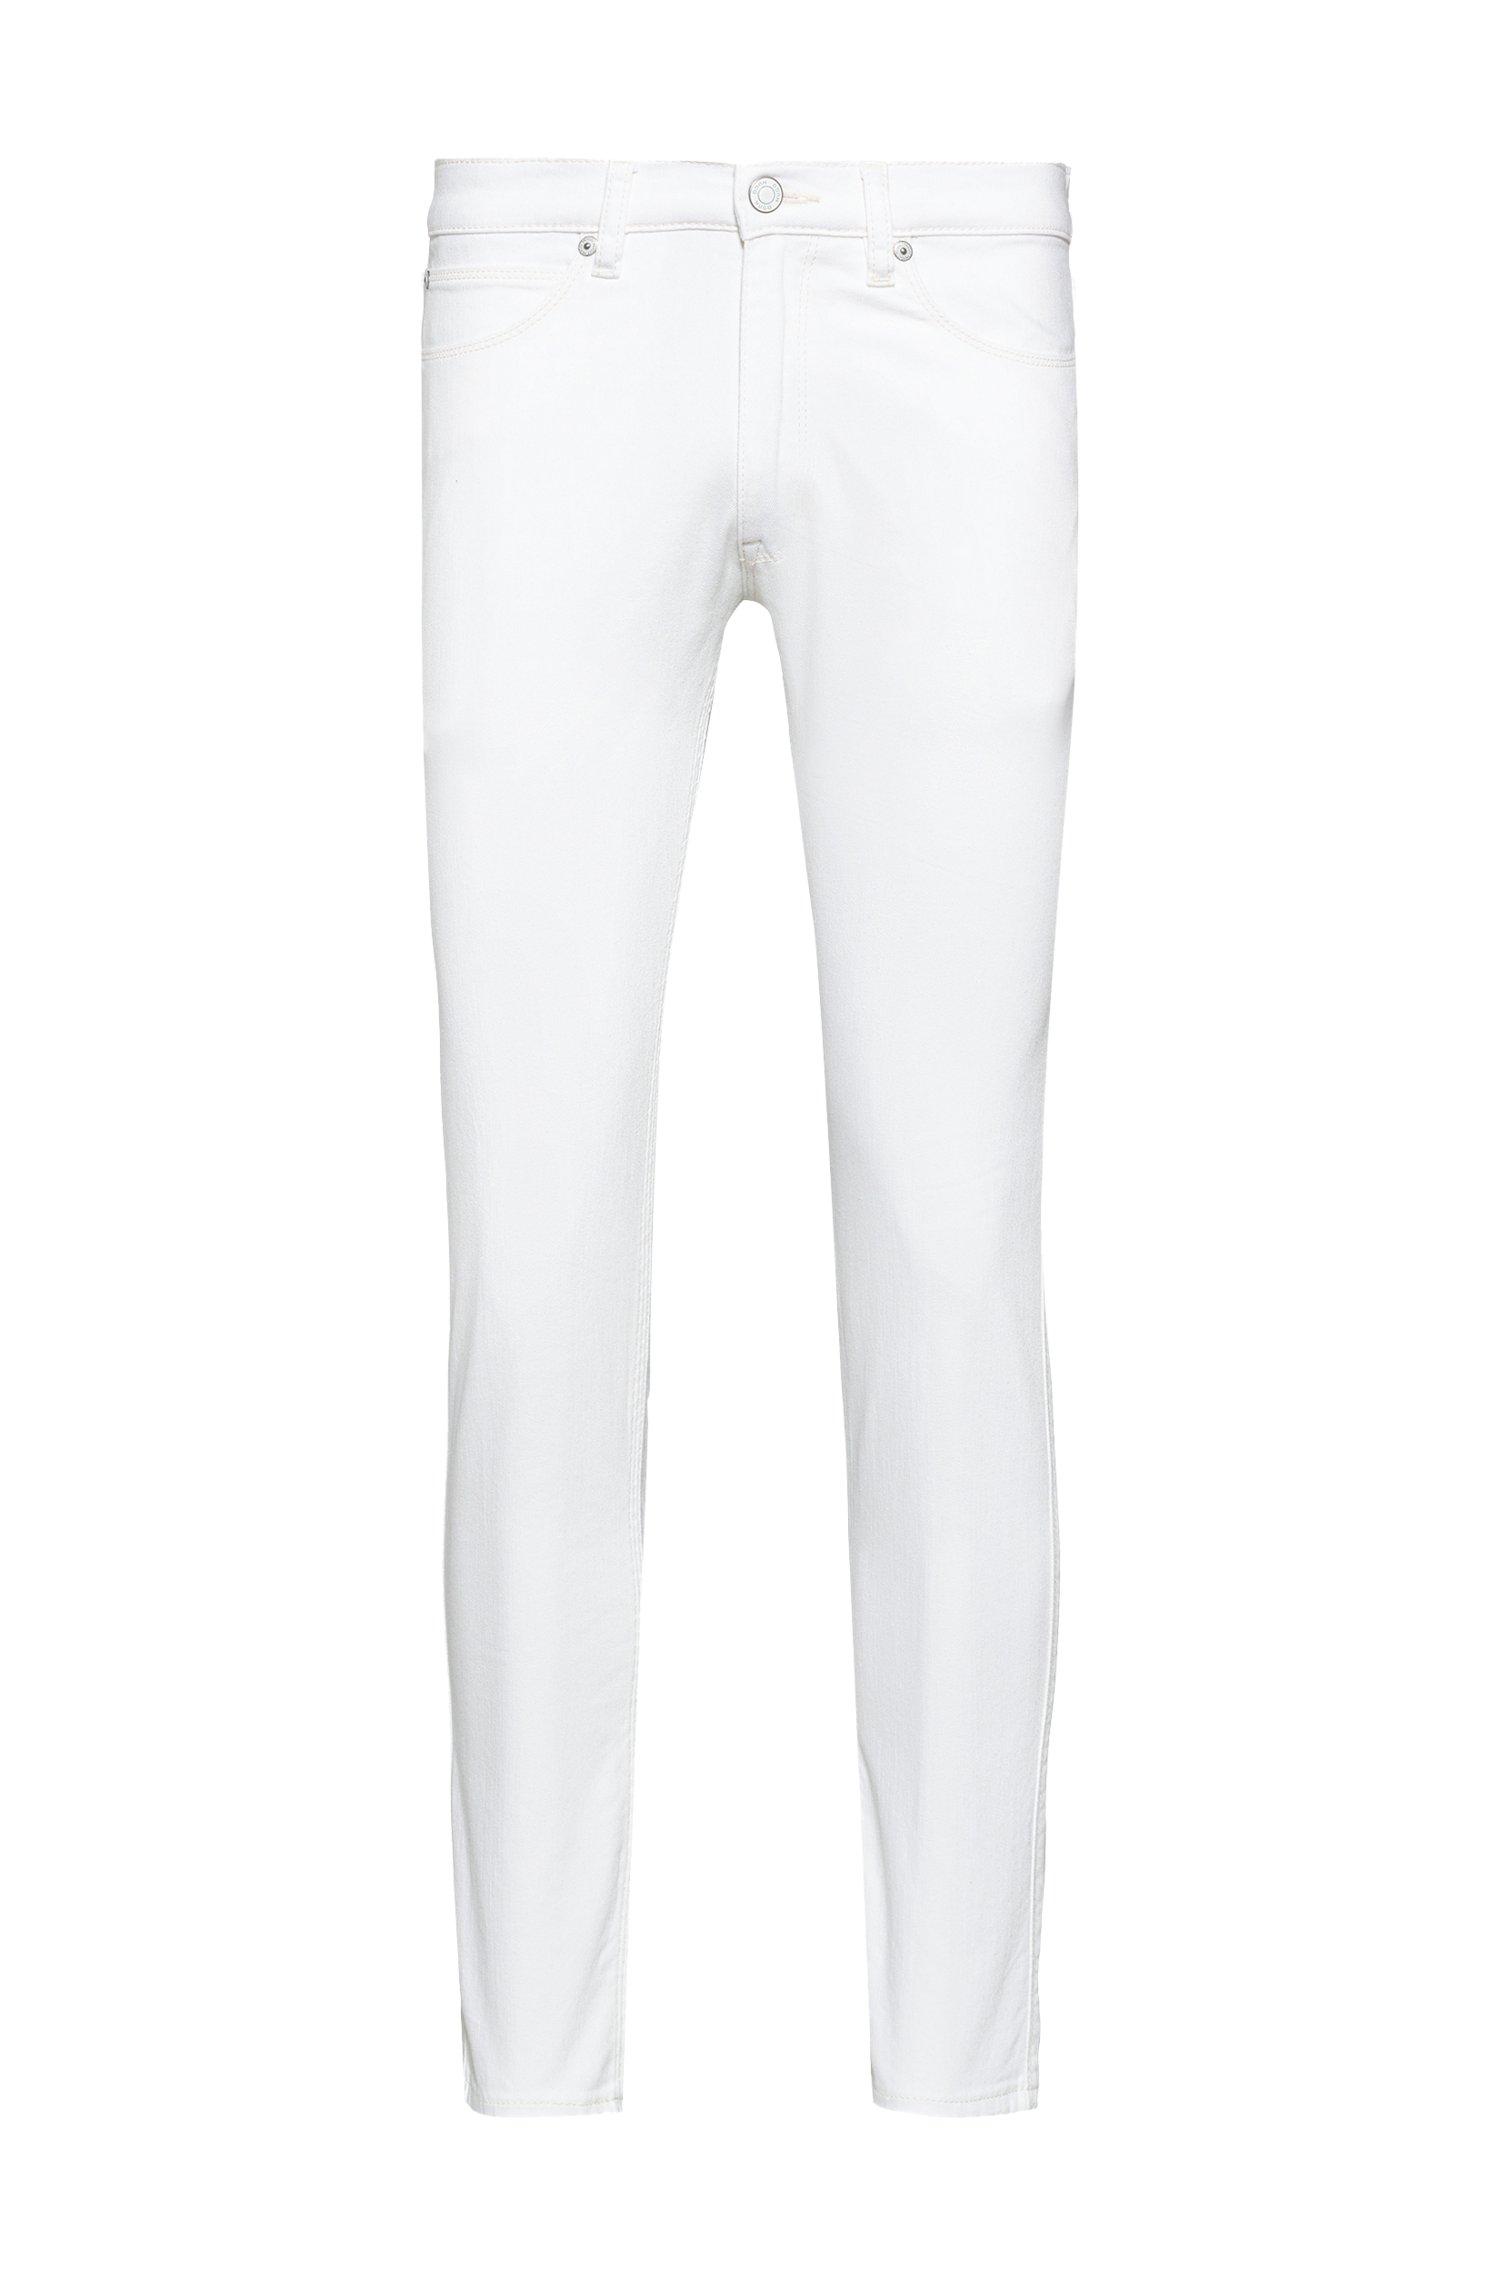 Extra-slim-fit jeans in comfort-stretch denim, White